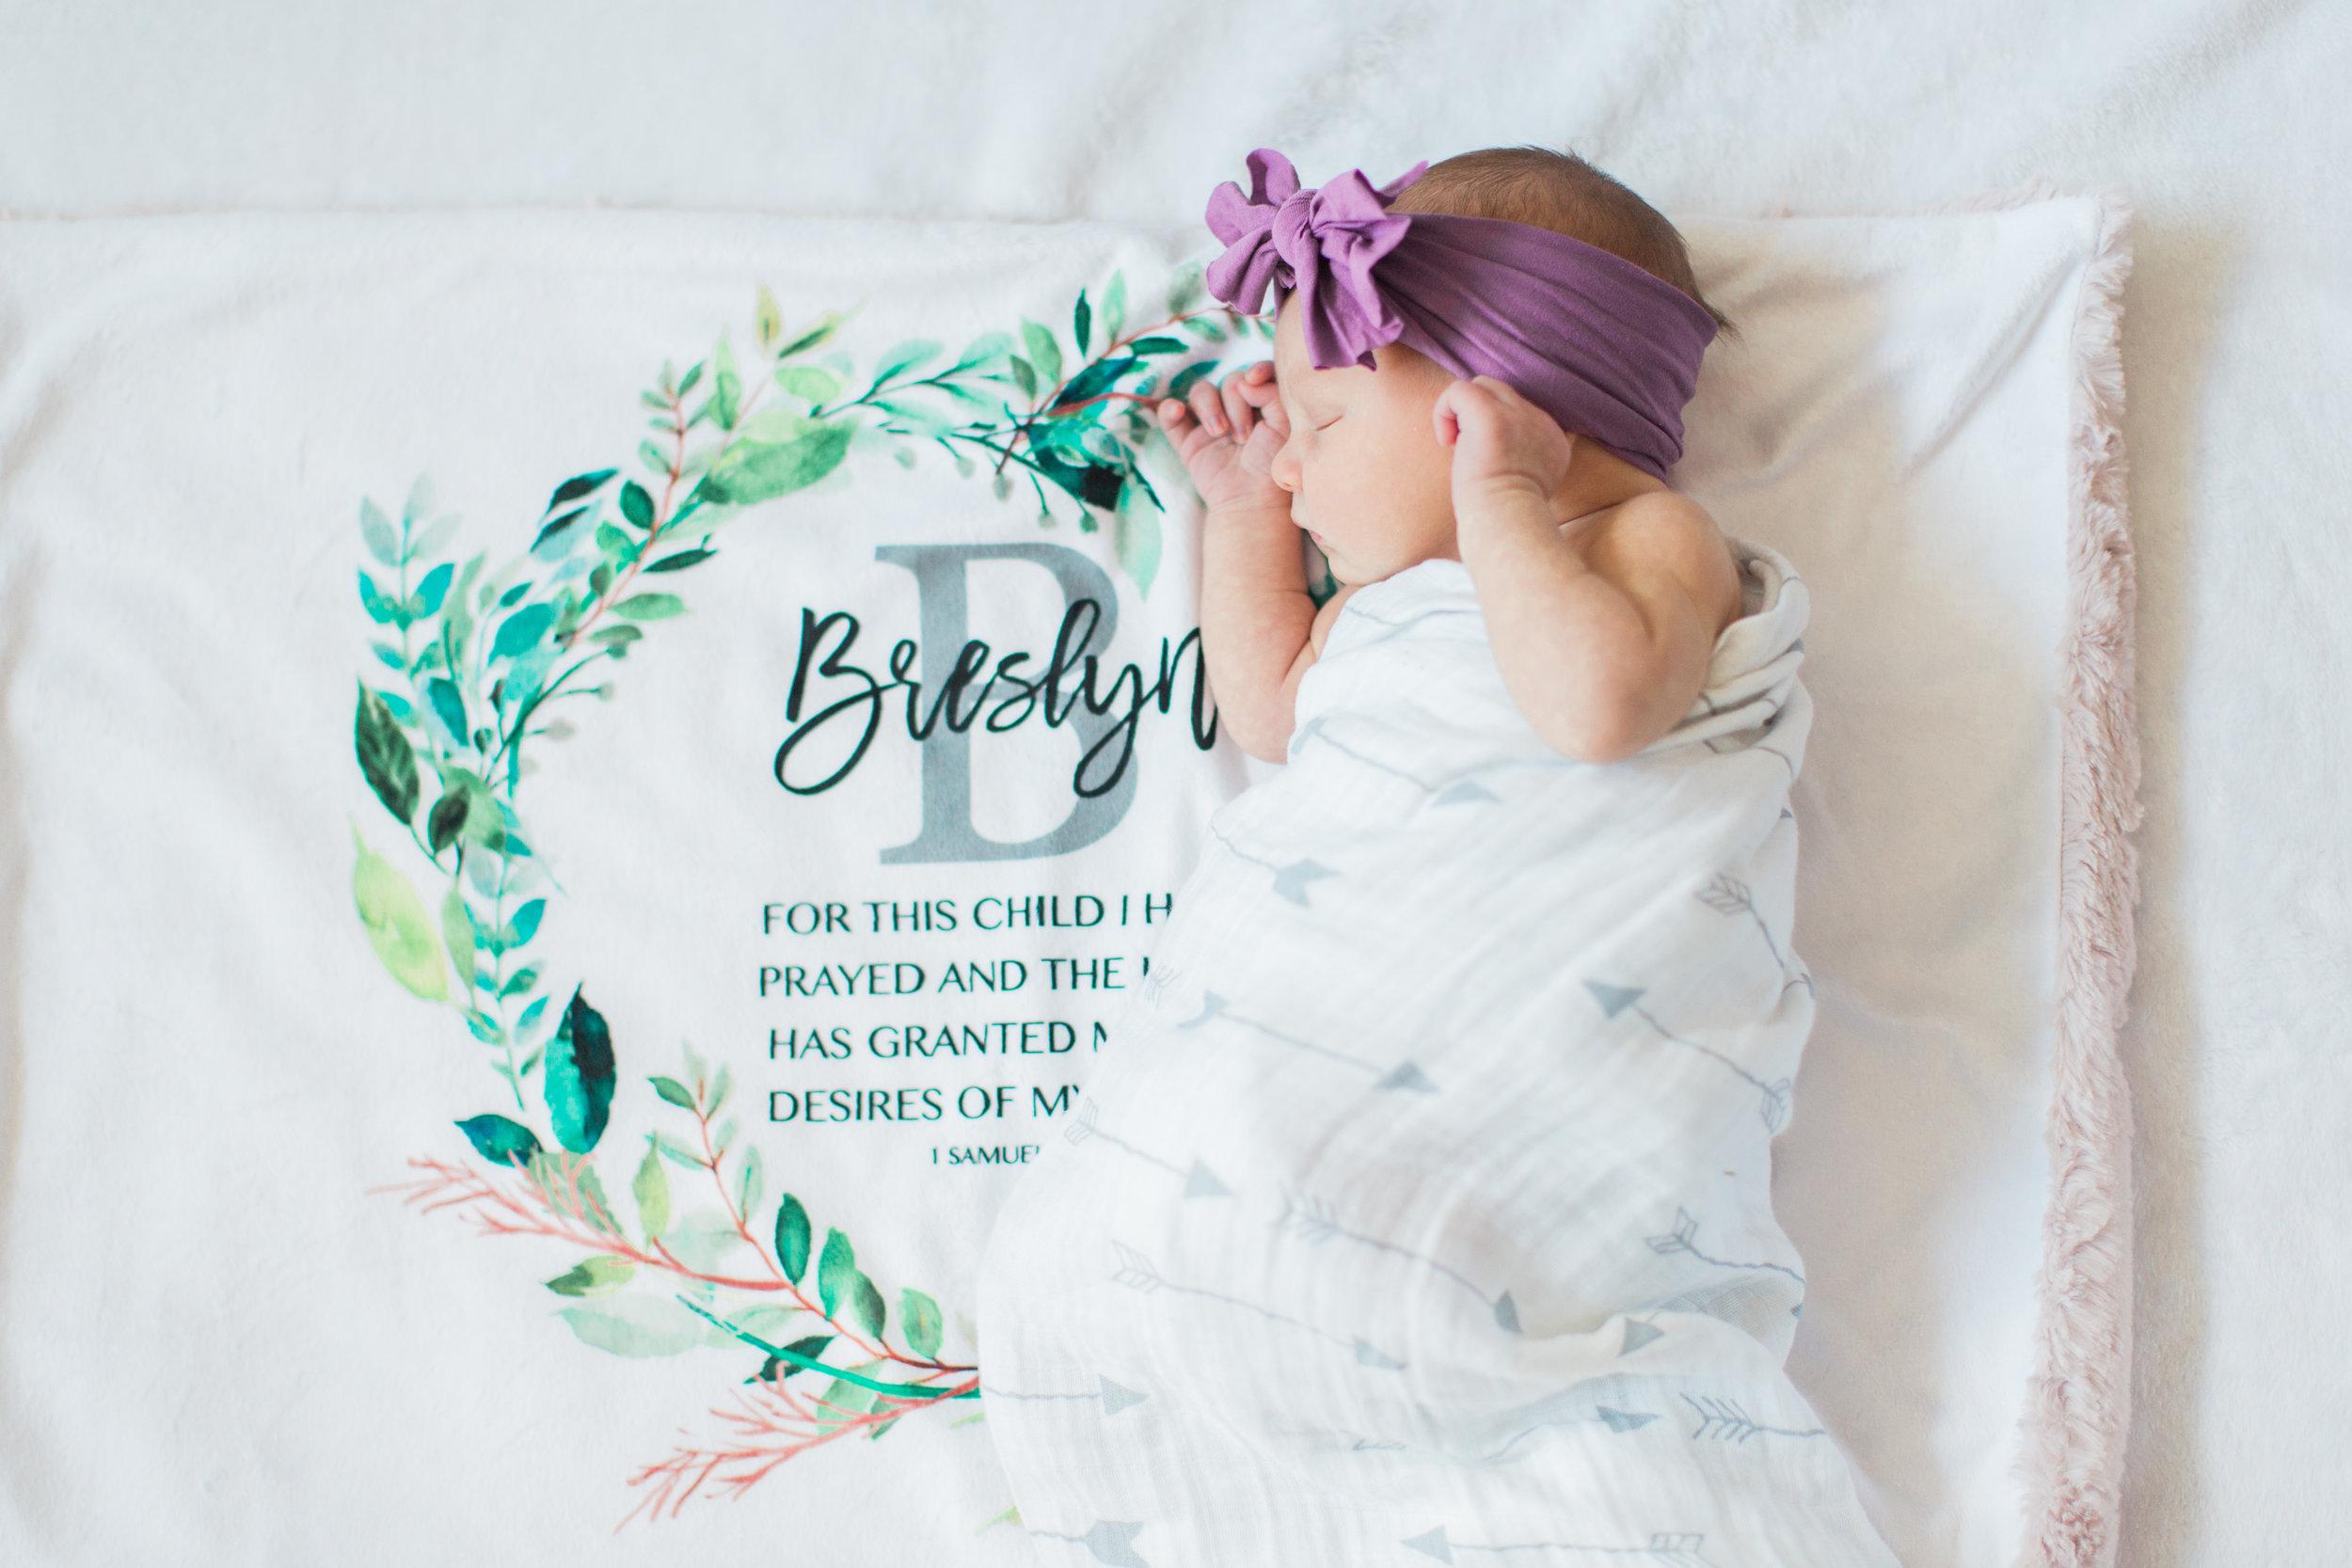 Breslyn Joy-104.jpg